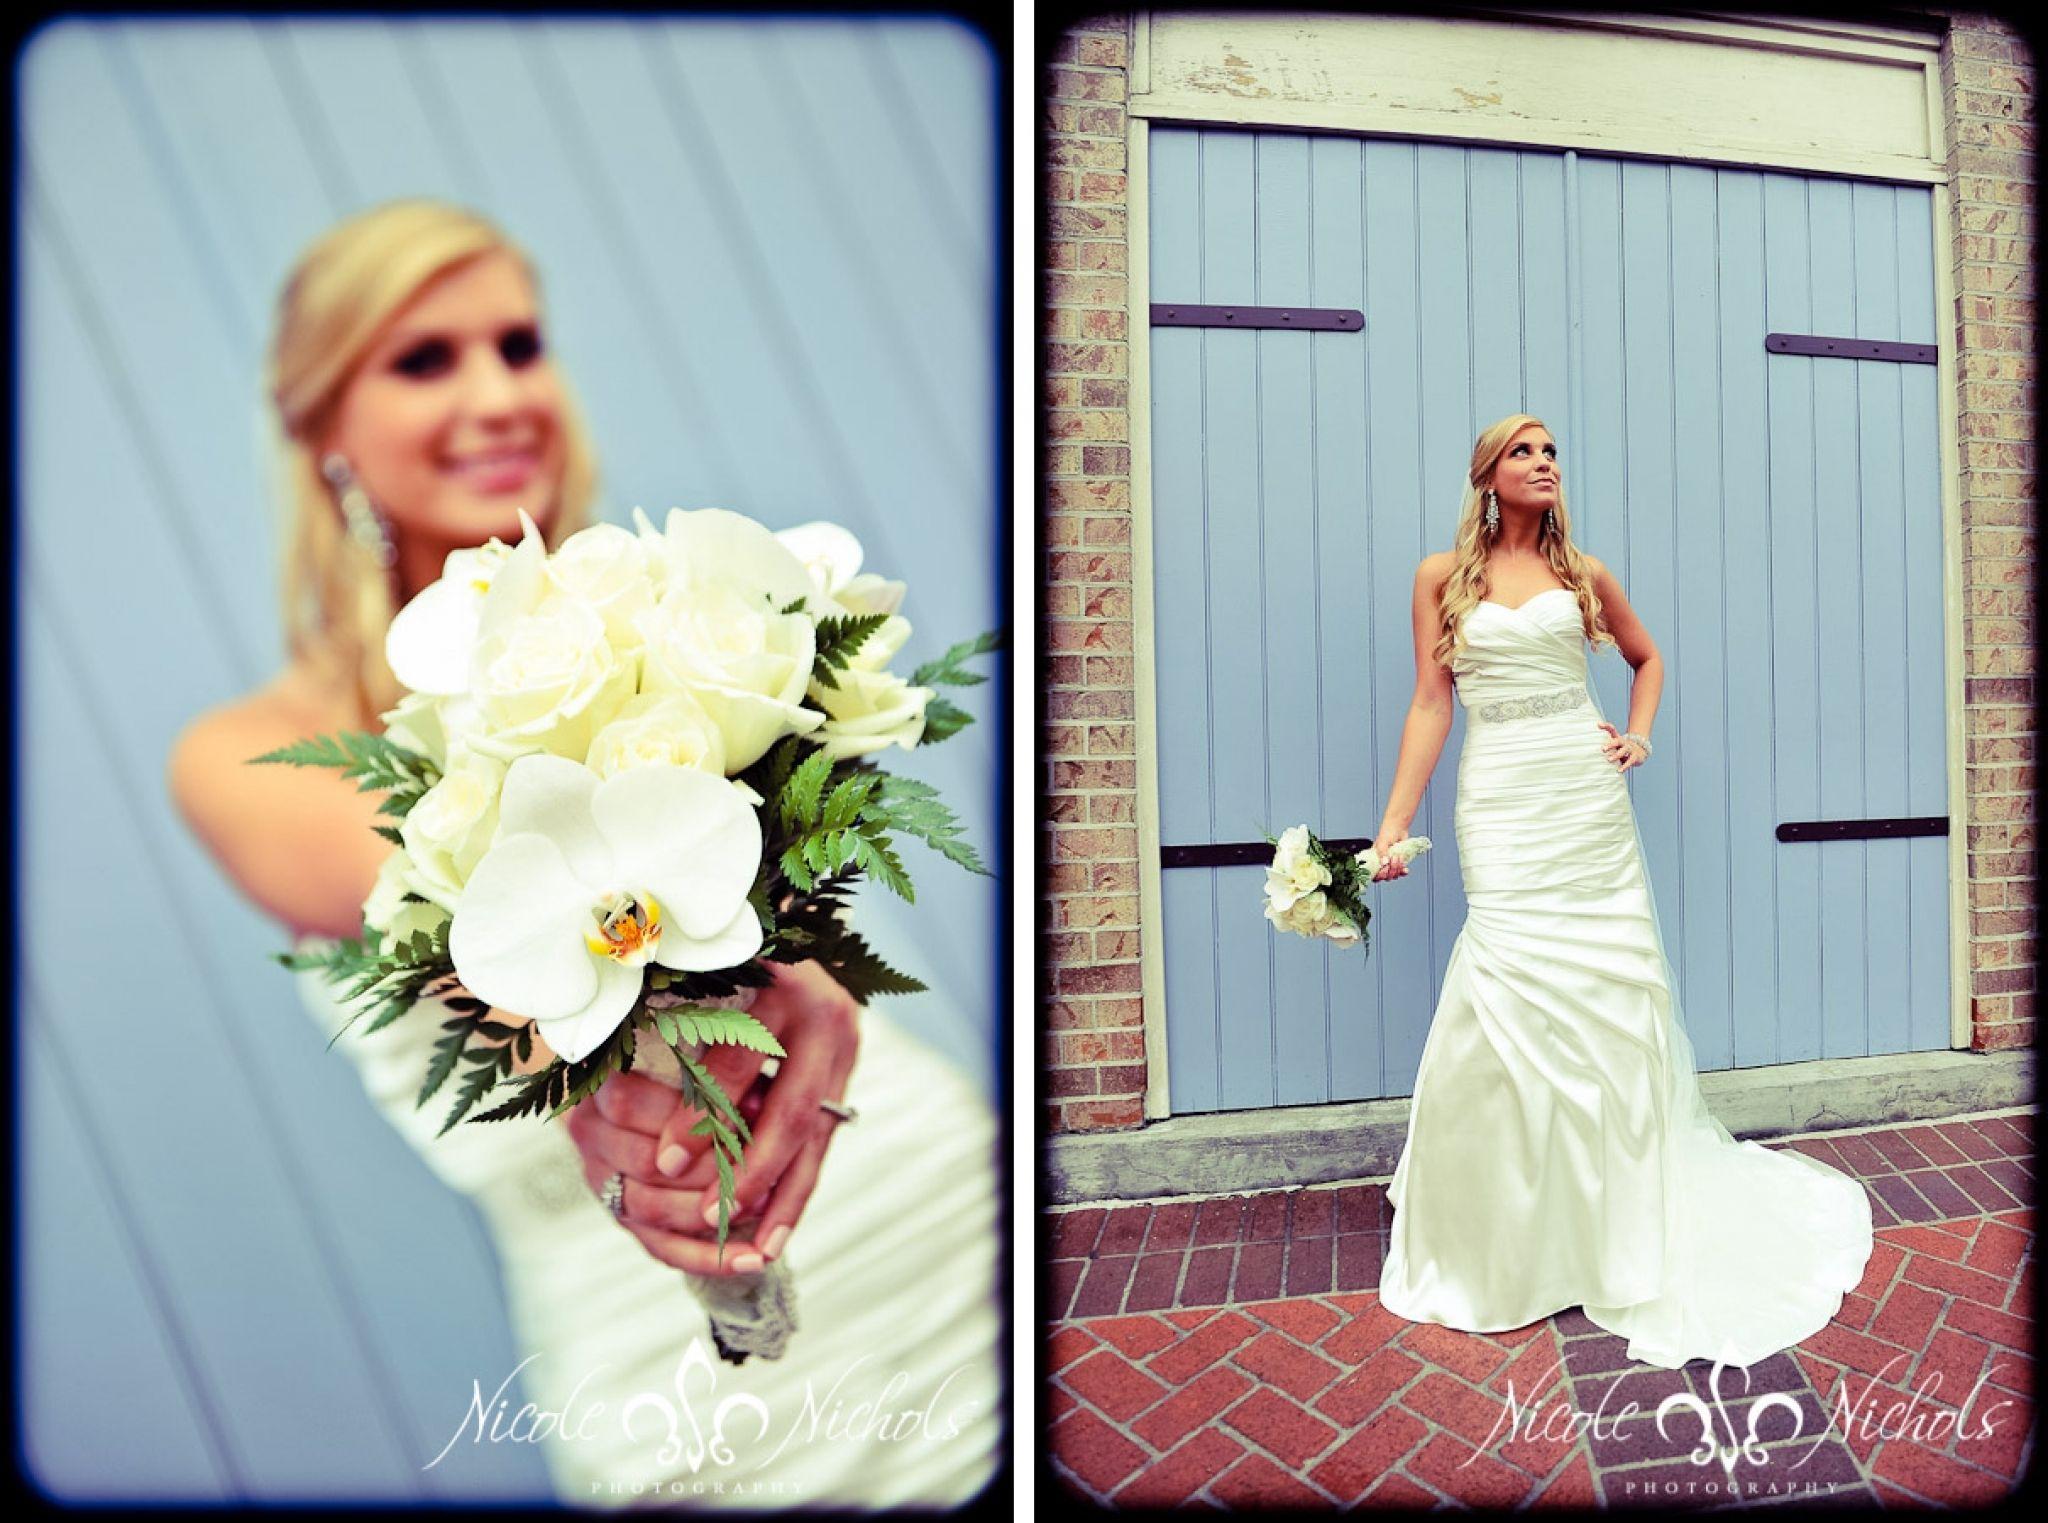 Famous Bridal Gowns New Orleans Images - Wedding Ideas - memiocall.com